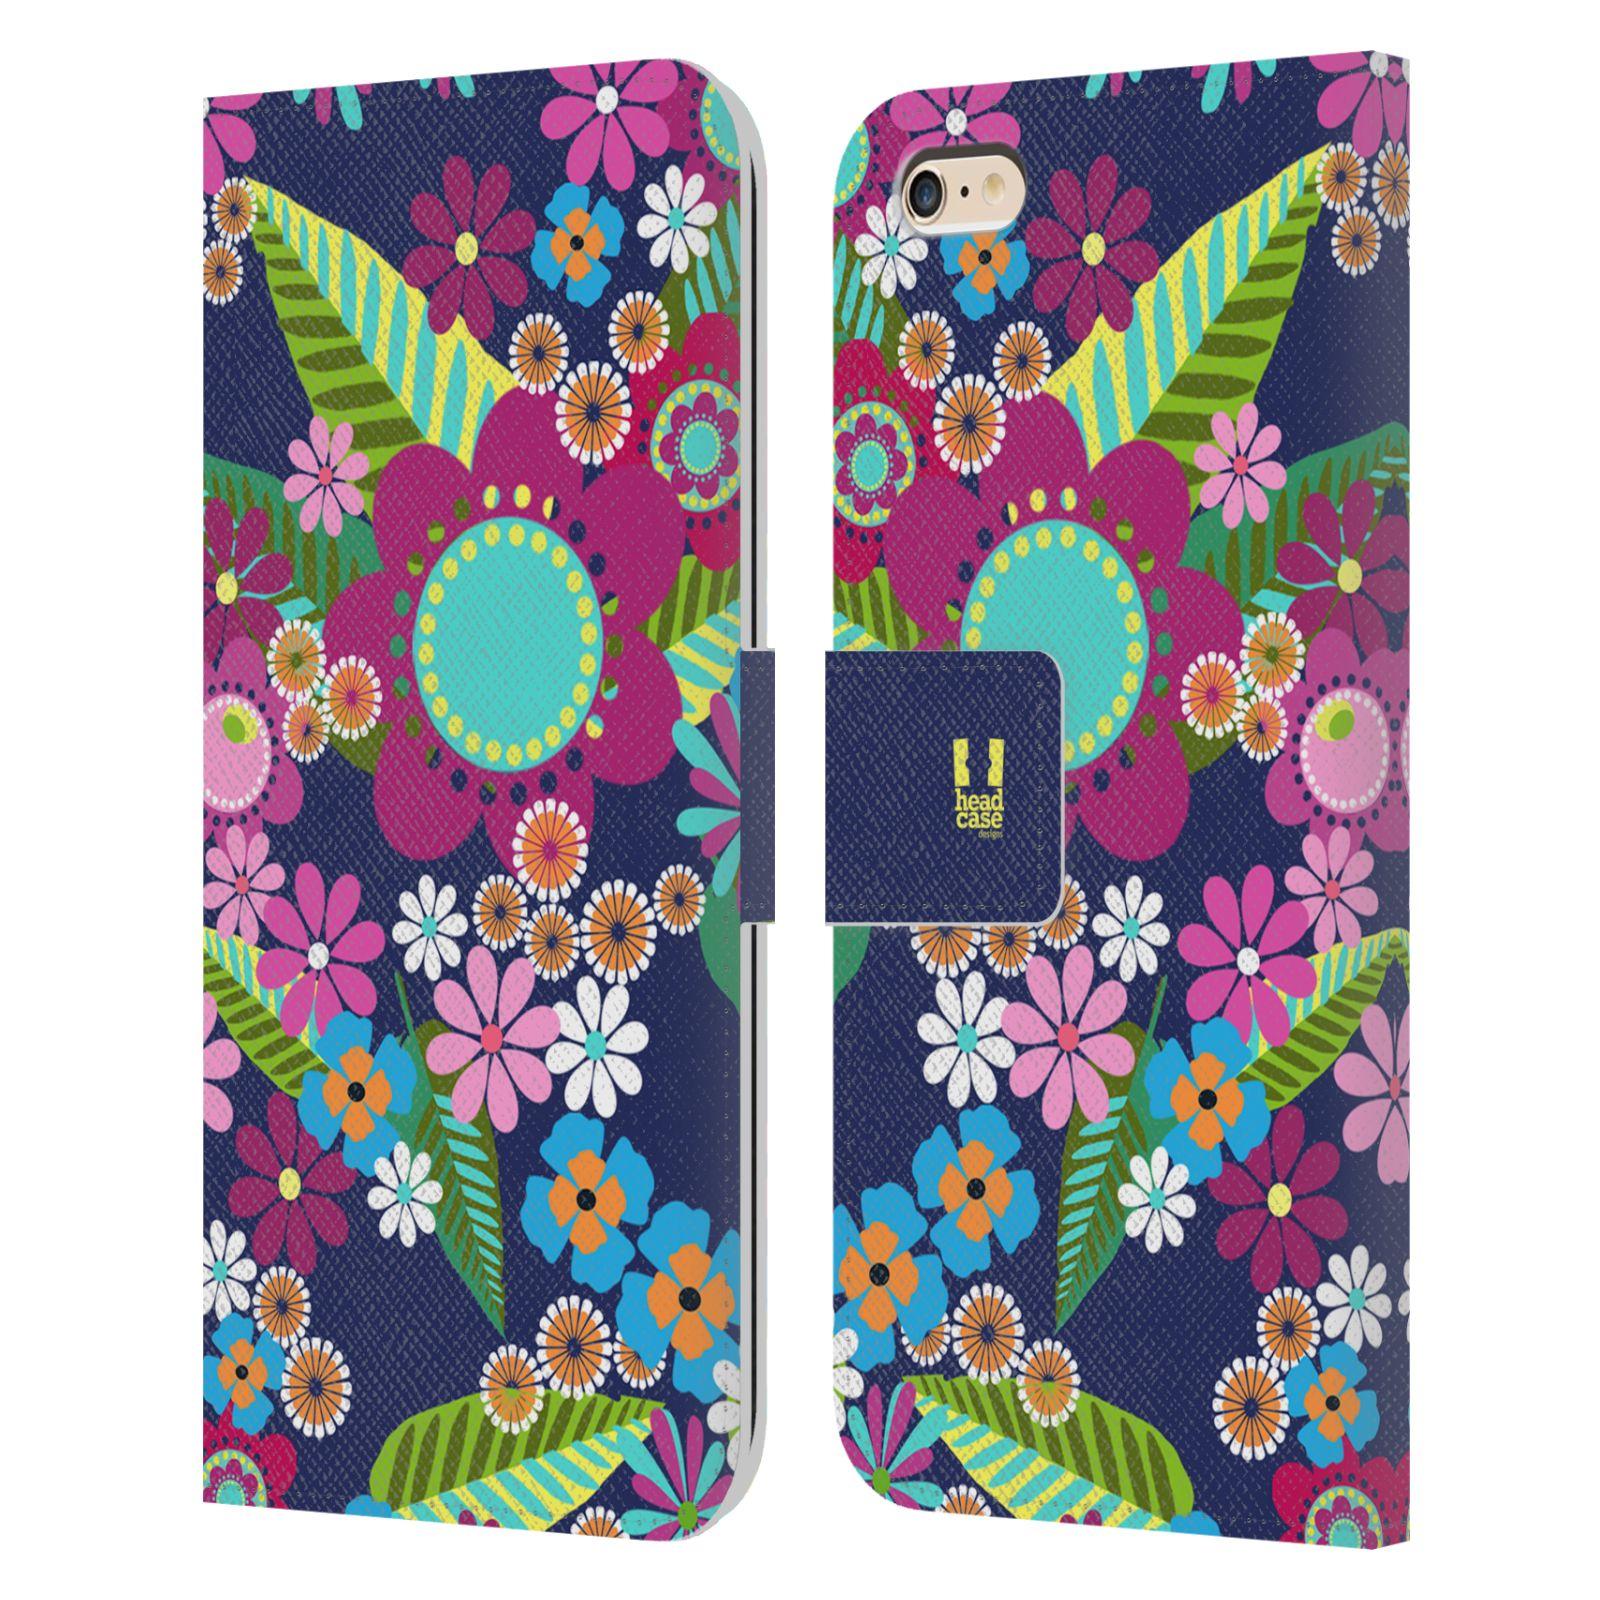 HEAD CASE Flipové pouzdro pro mobil Apple Iphone 6 PLUS / 6S PLUS BOTANIKA barevné květy modrá